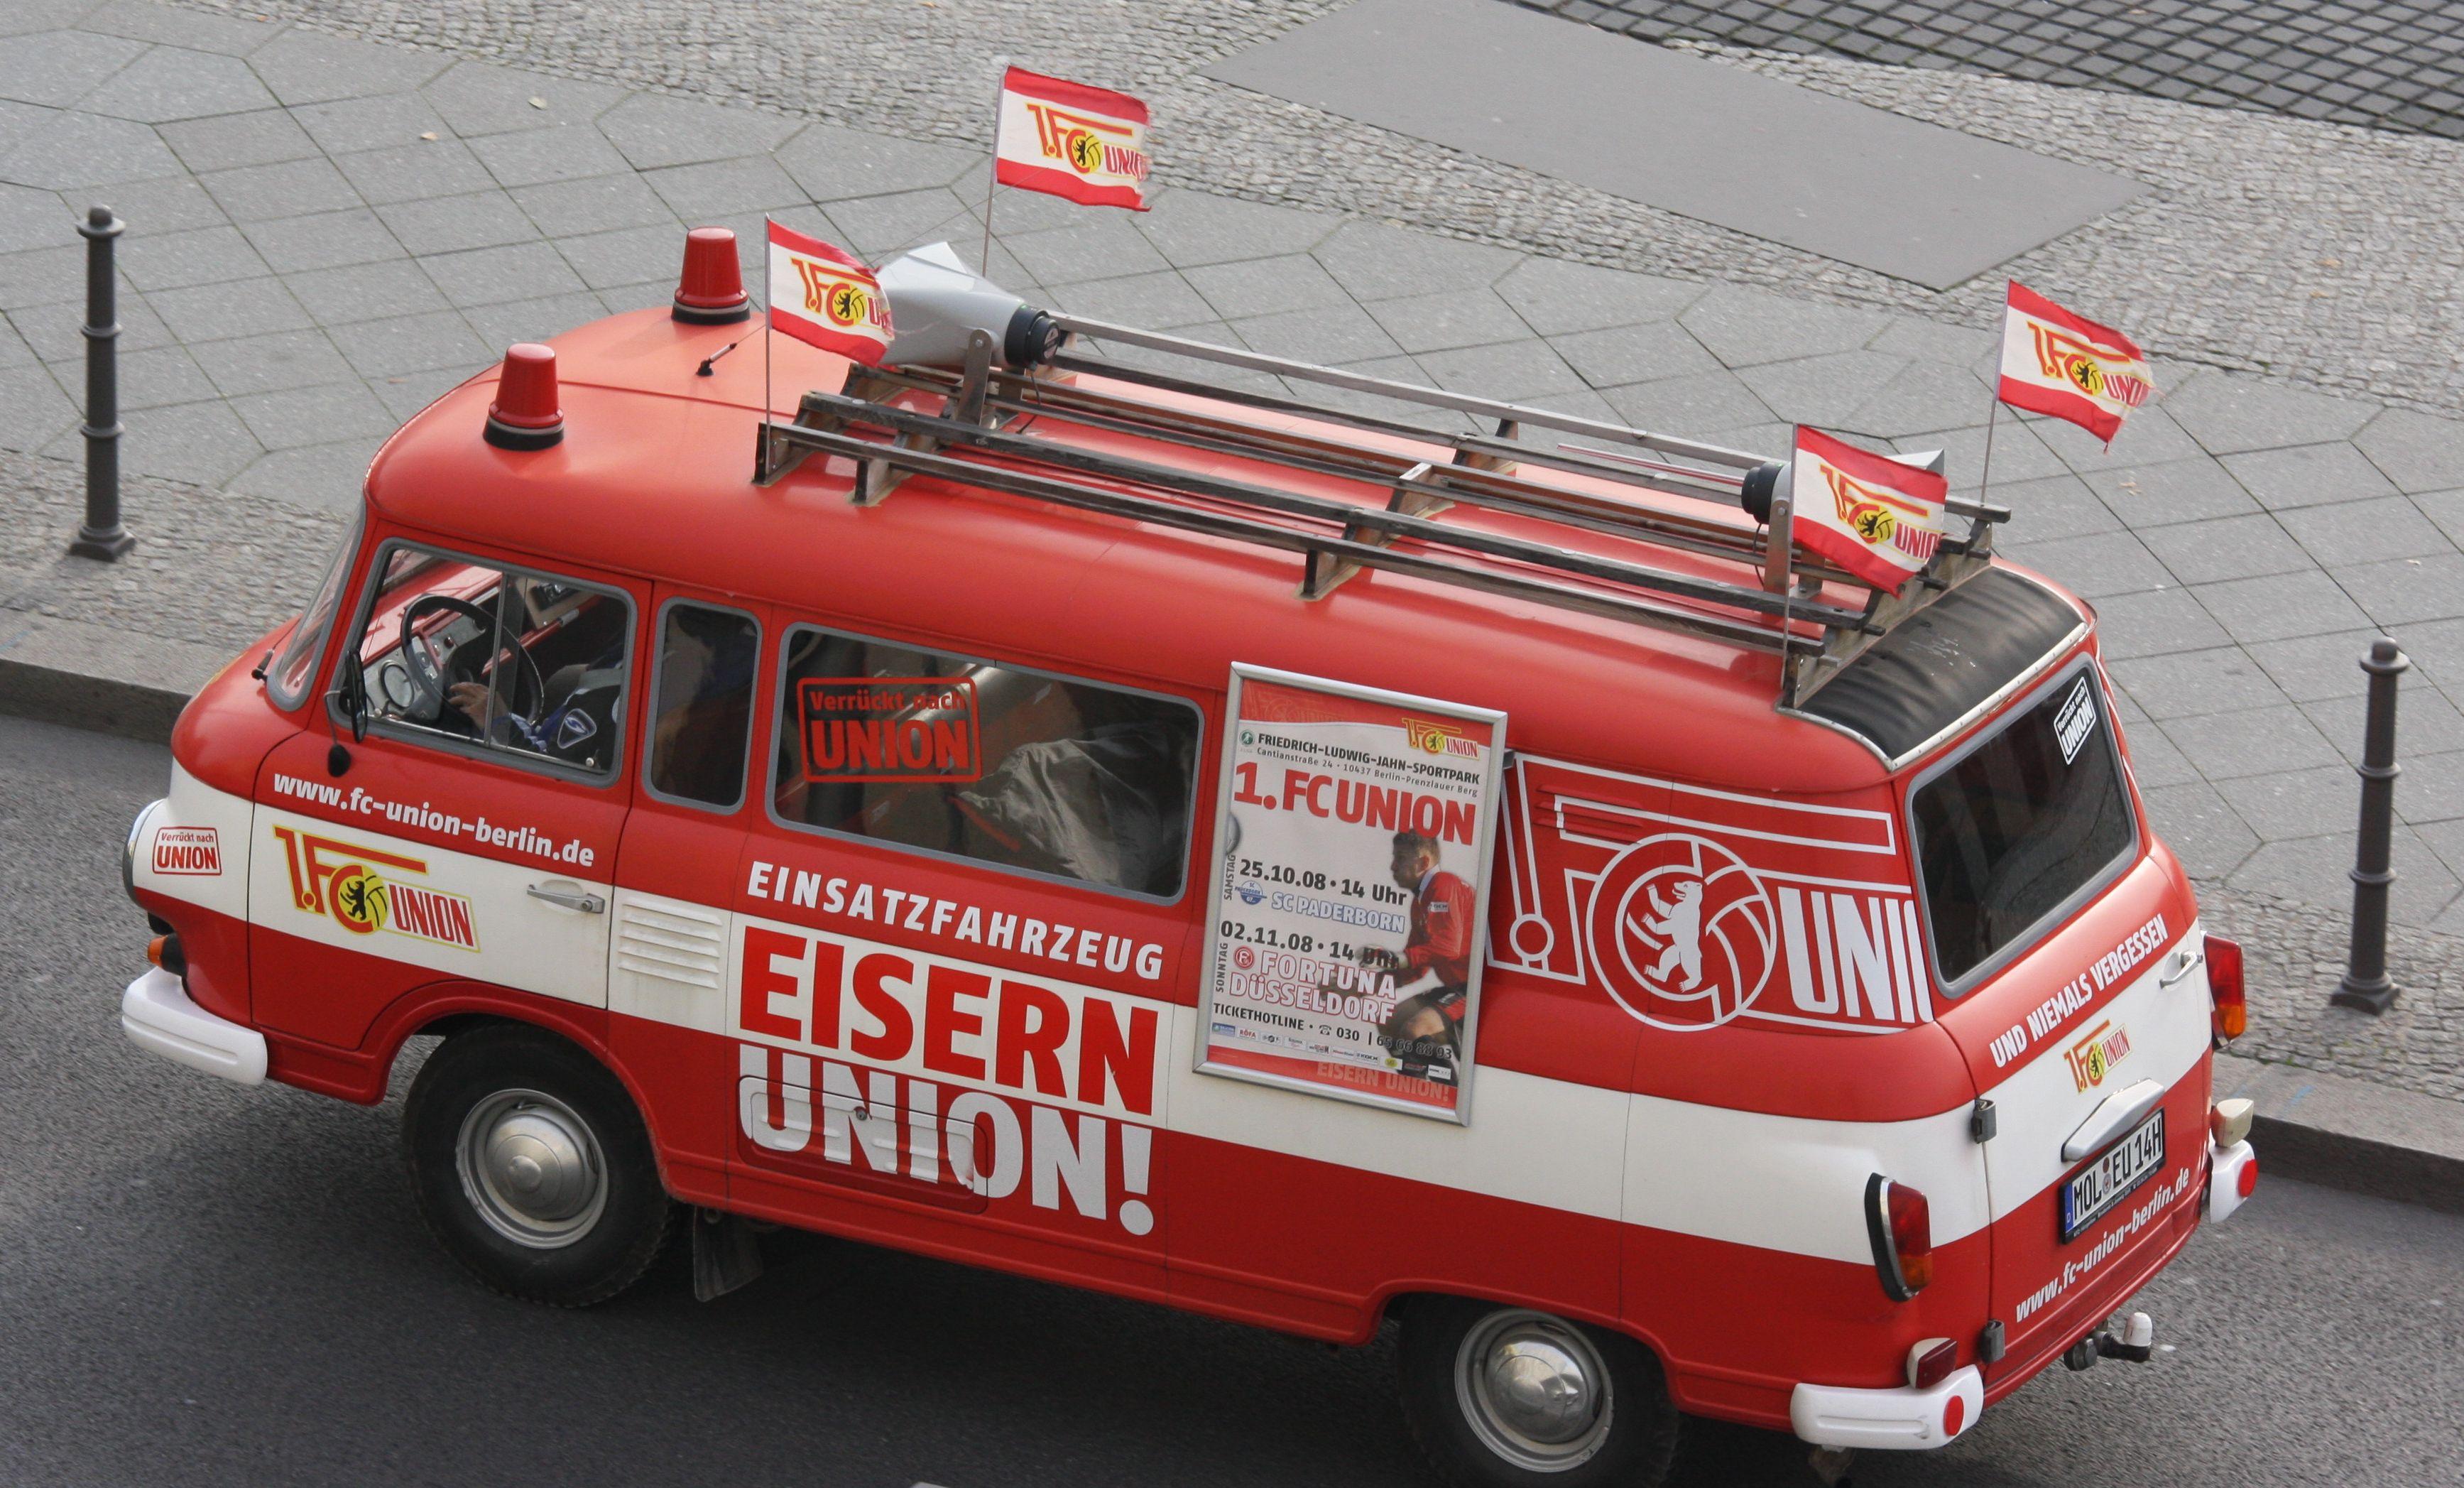 Eisern Union Forum